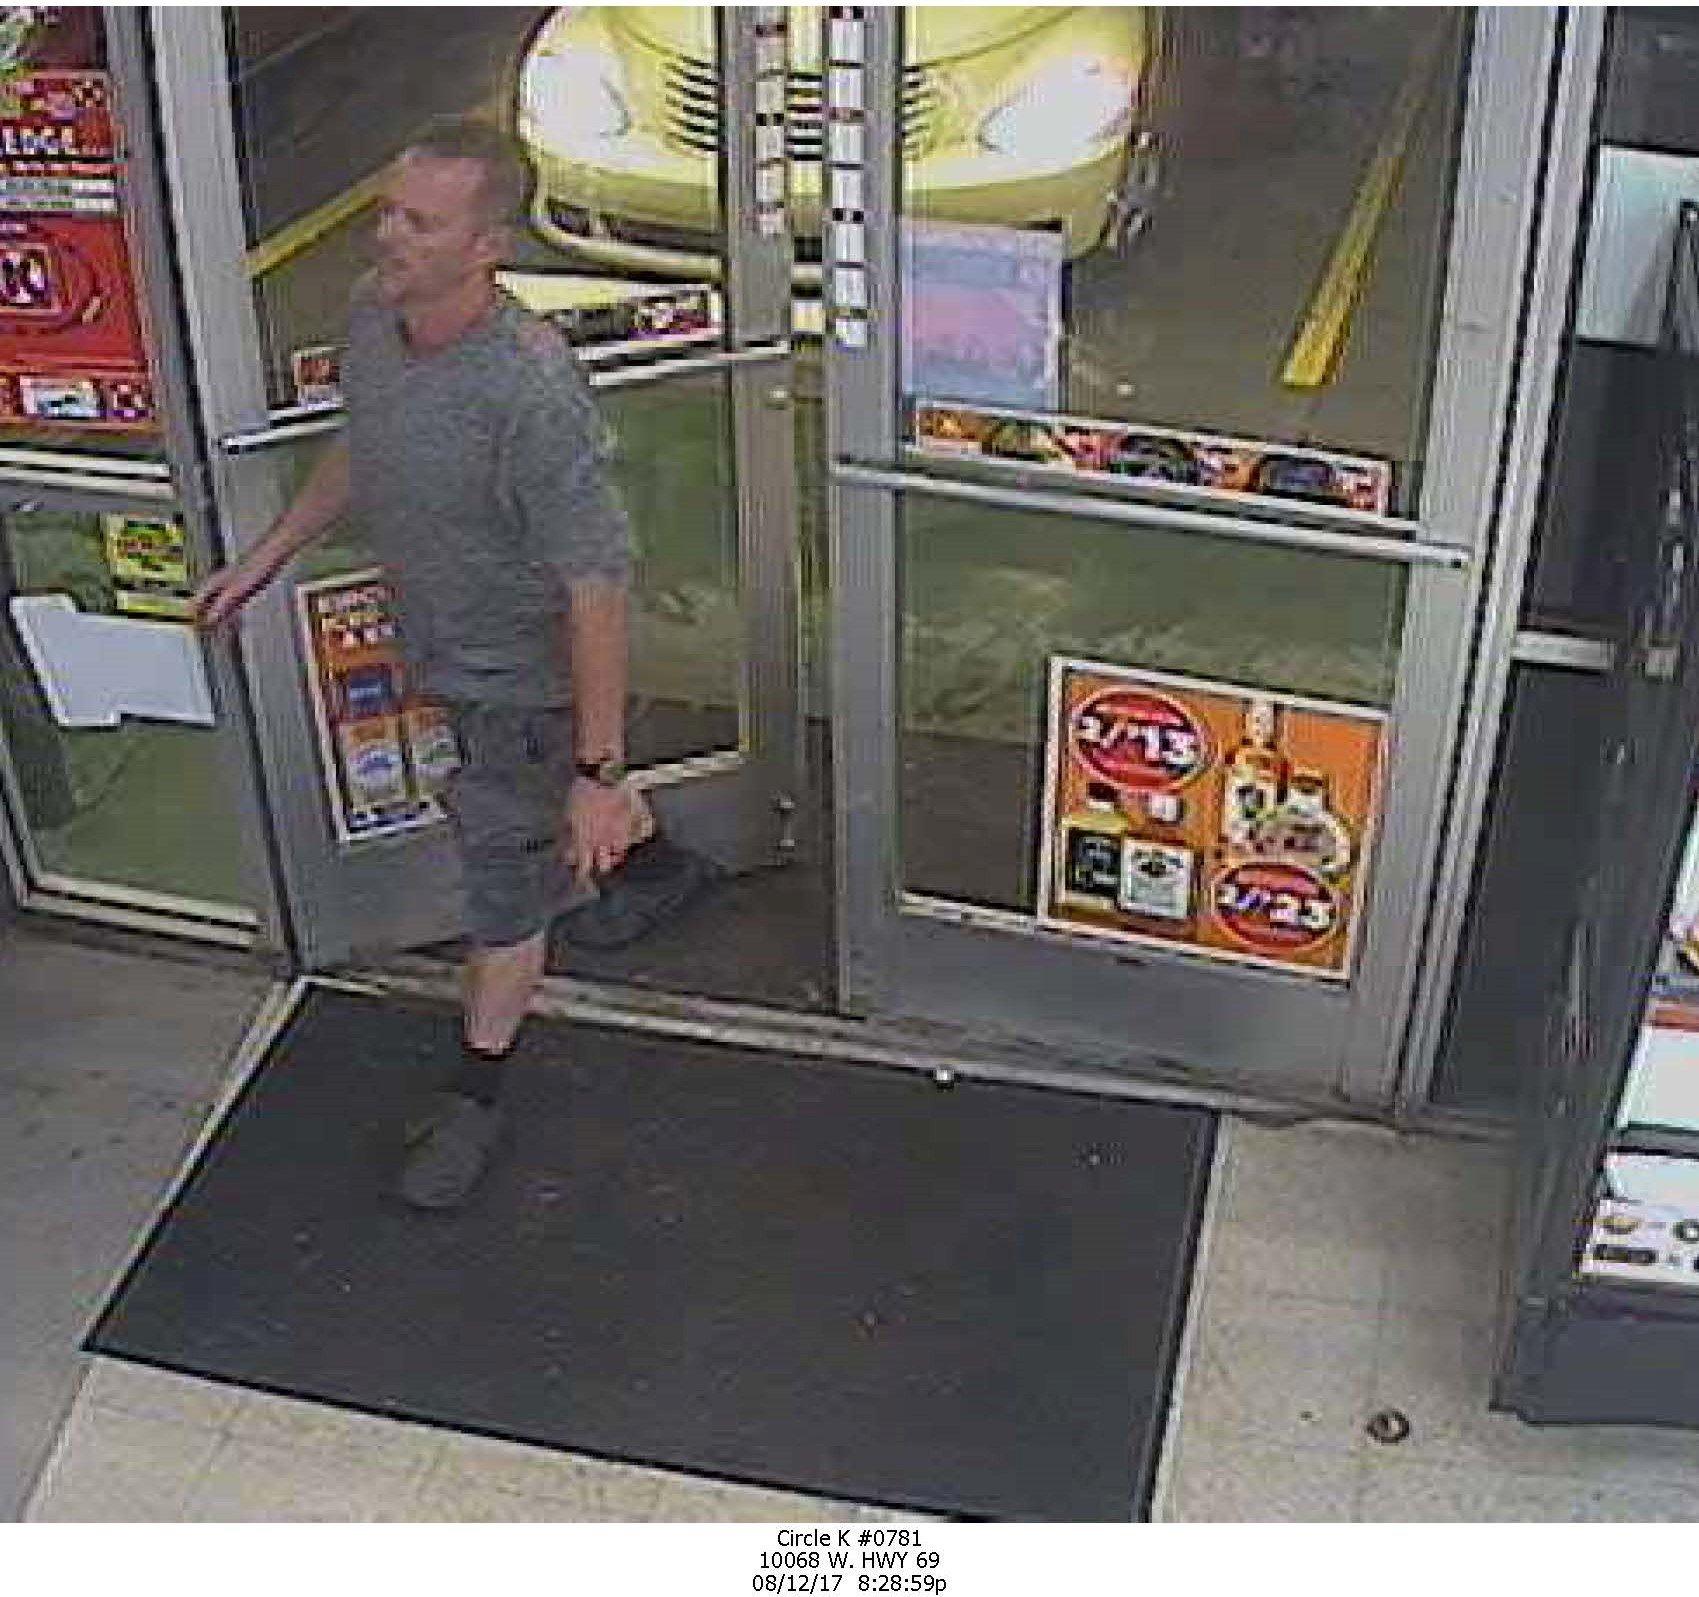 Man suspected of passing fake $100 bill. (Source: Yavapai County Sheriff)